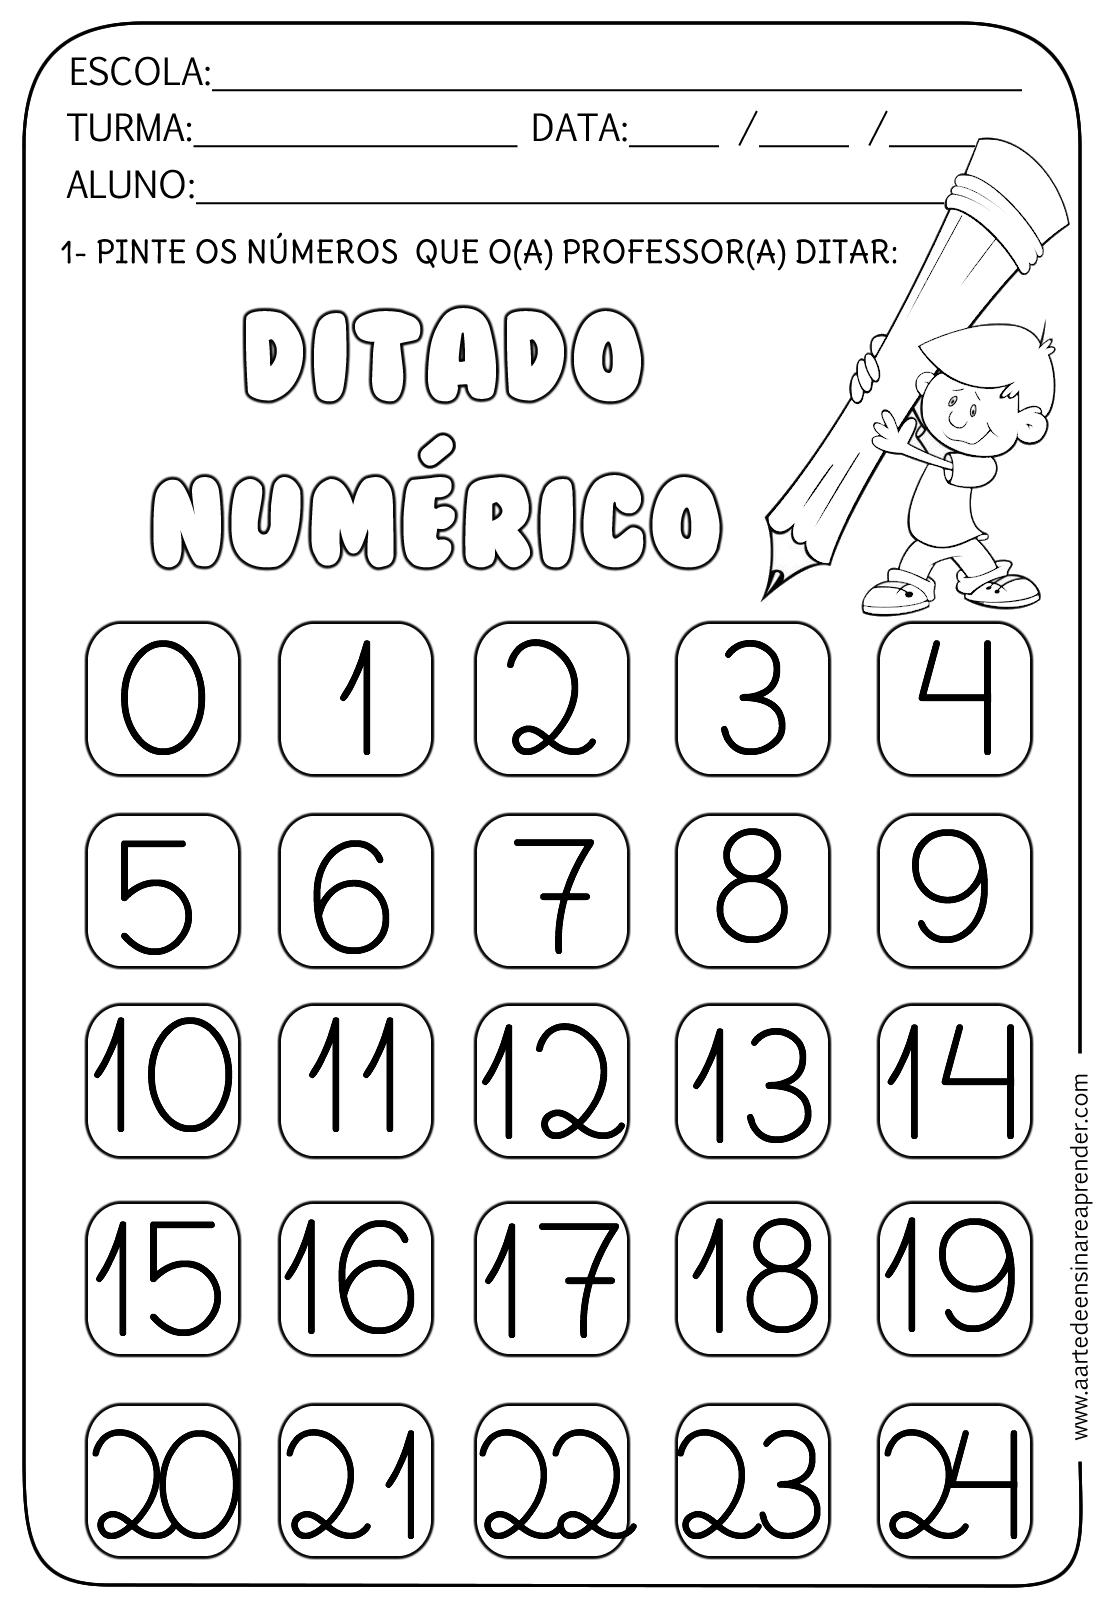 Ditado Numerico